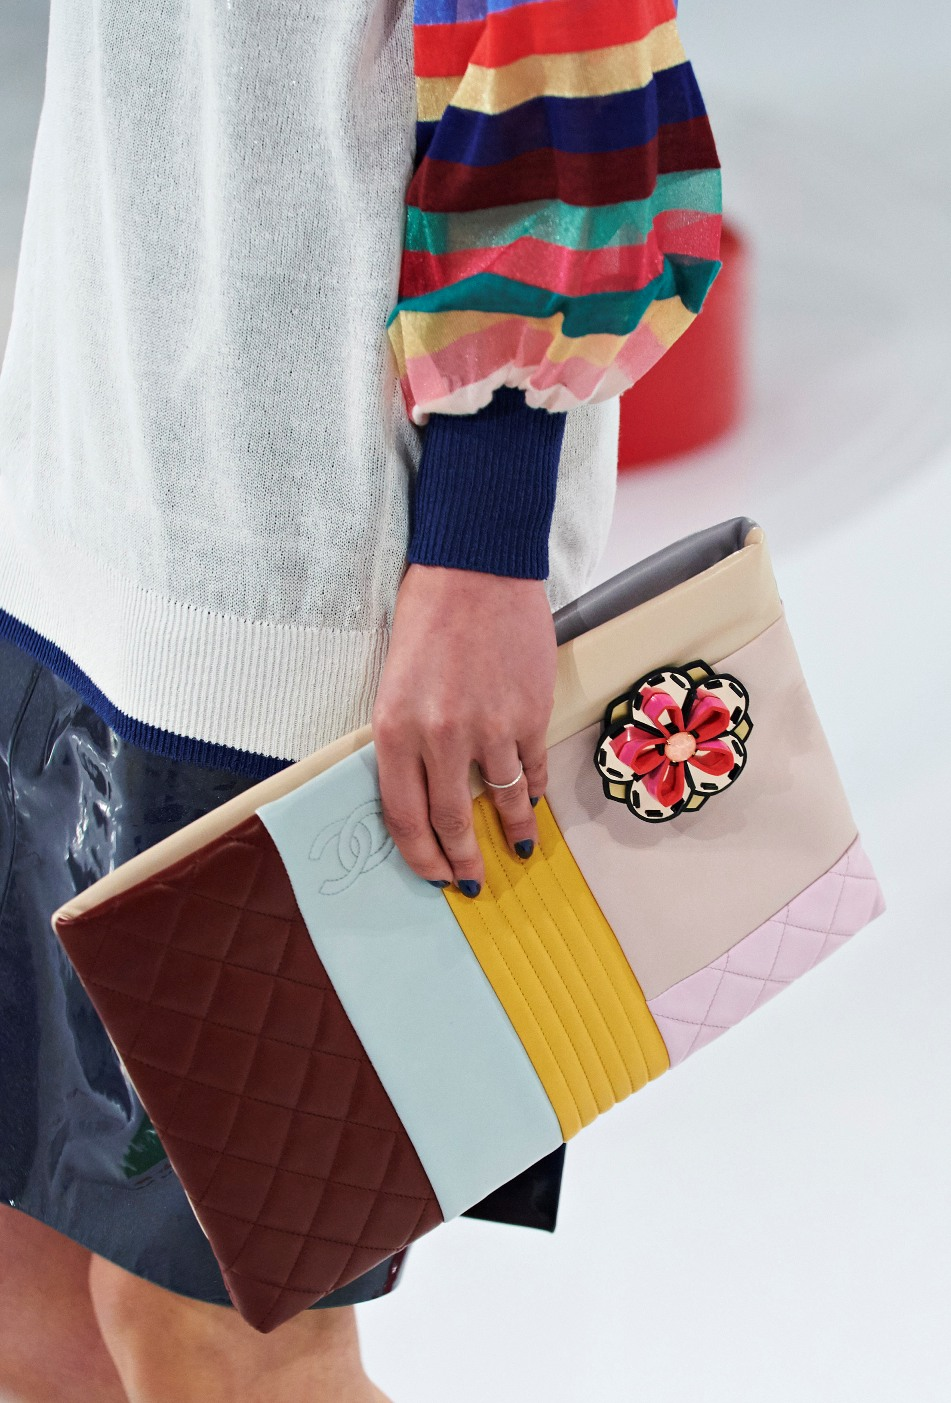 chanel-seoul-resort-cruise-2016-bags-accessories-7  0eecf00bb5890